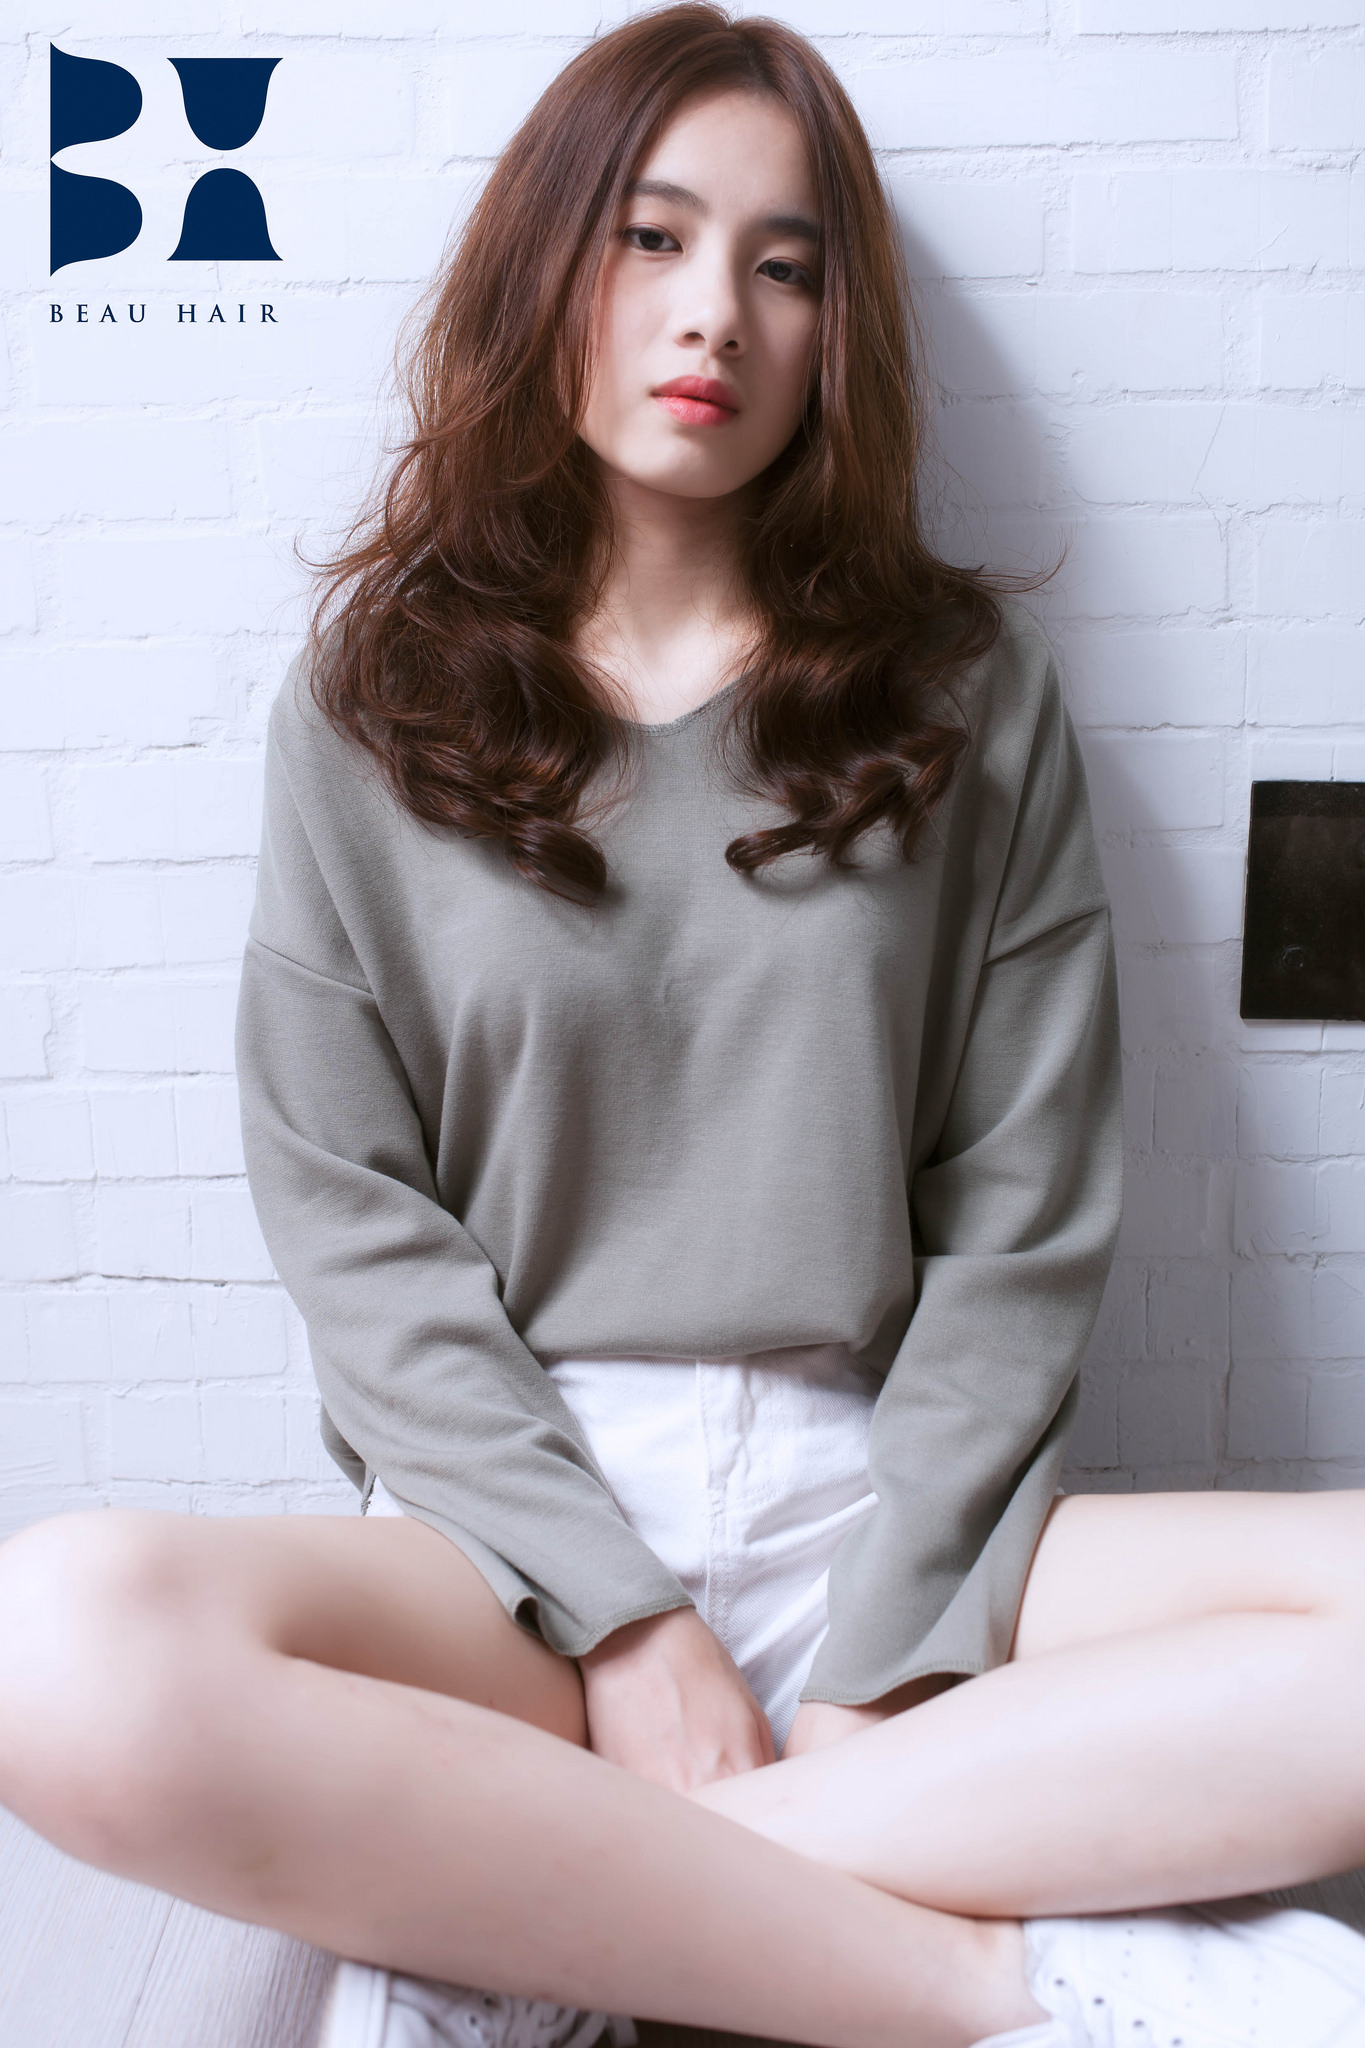 台北東區剪燙染髮BEAU HAIR 36632606213_f7662b70ae_k